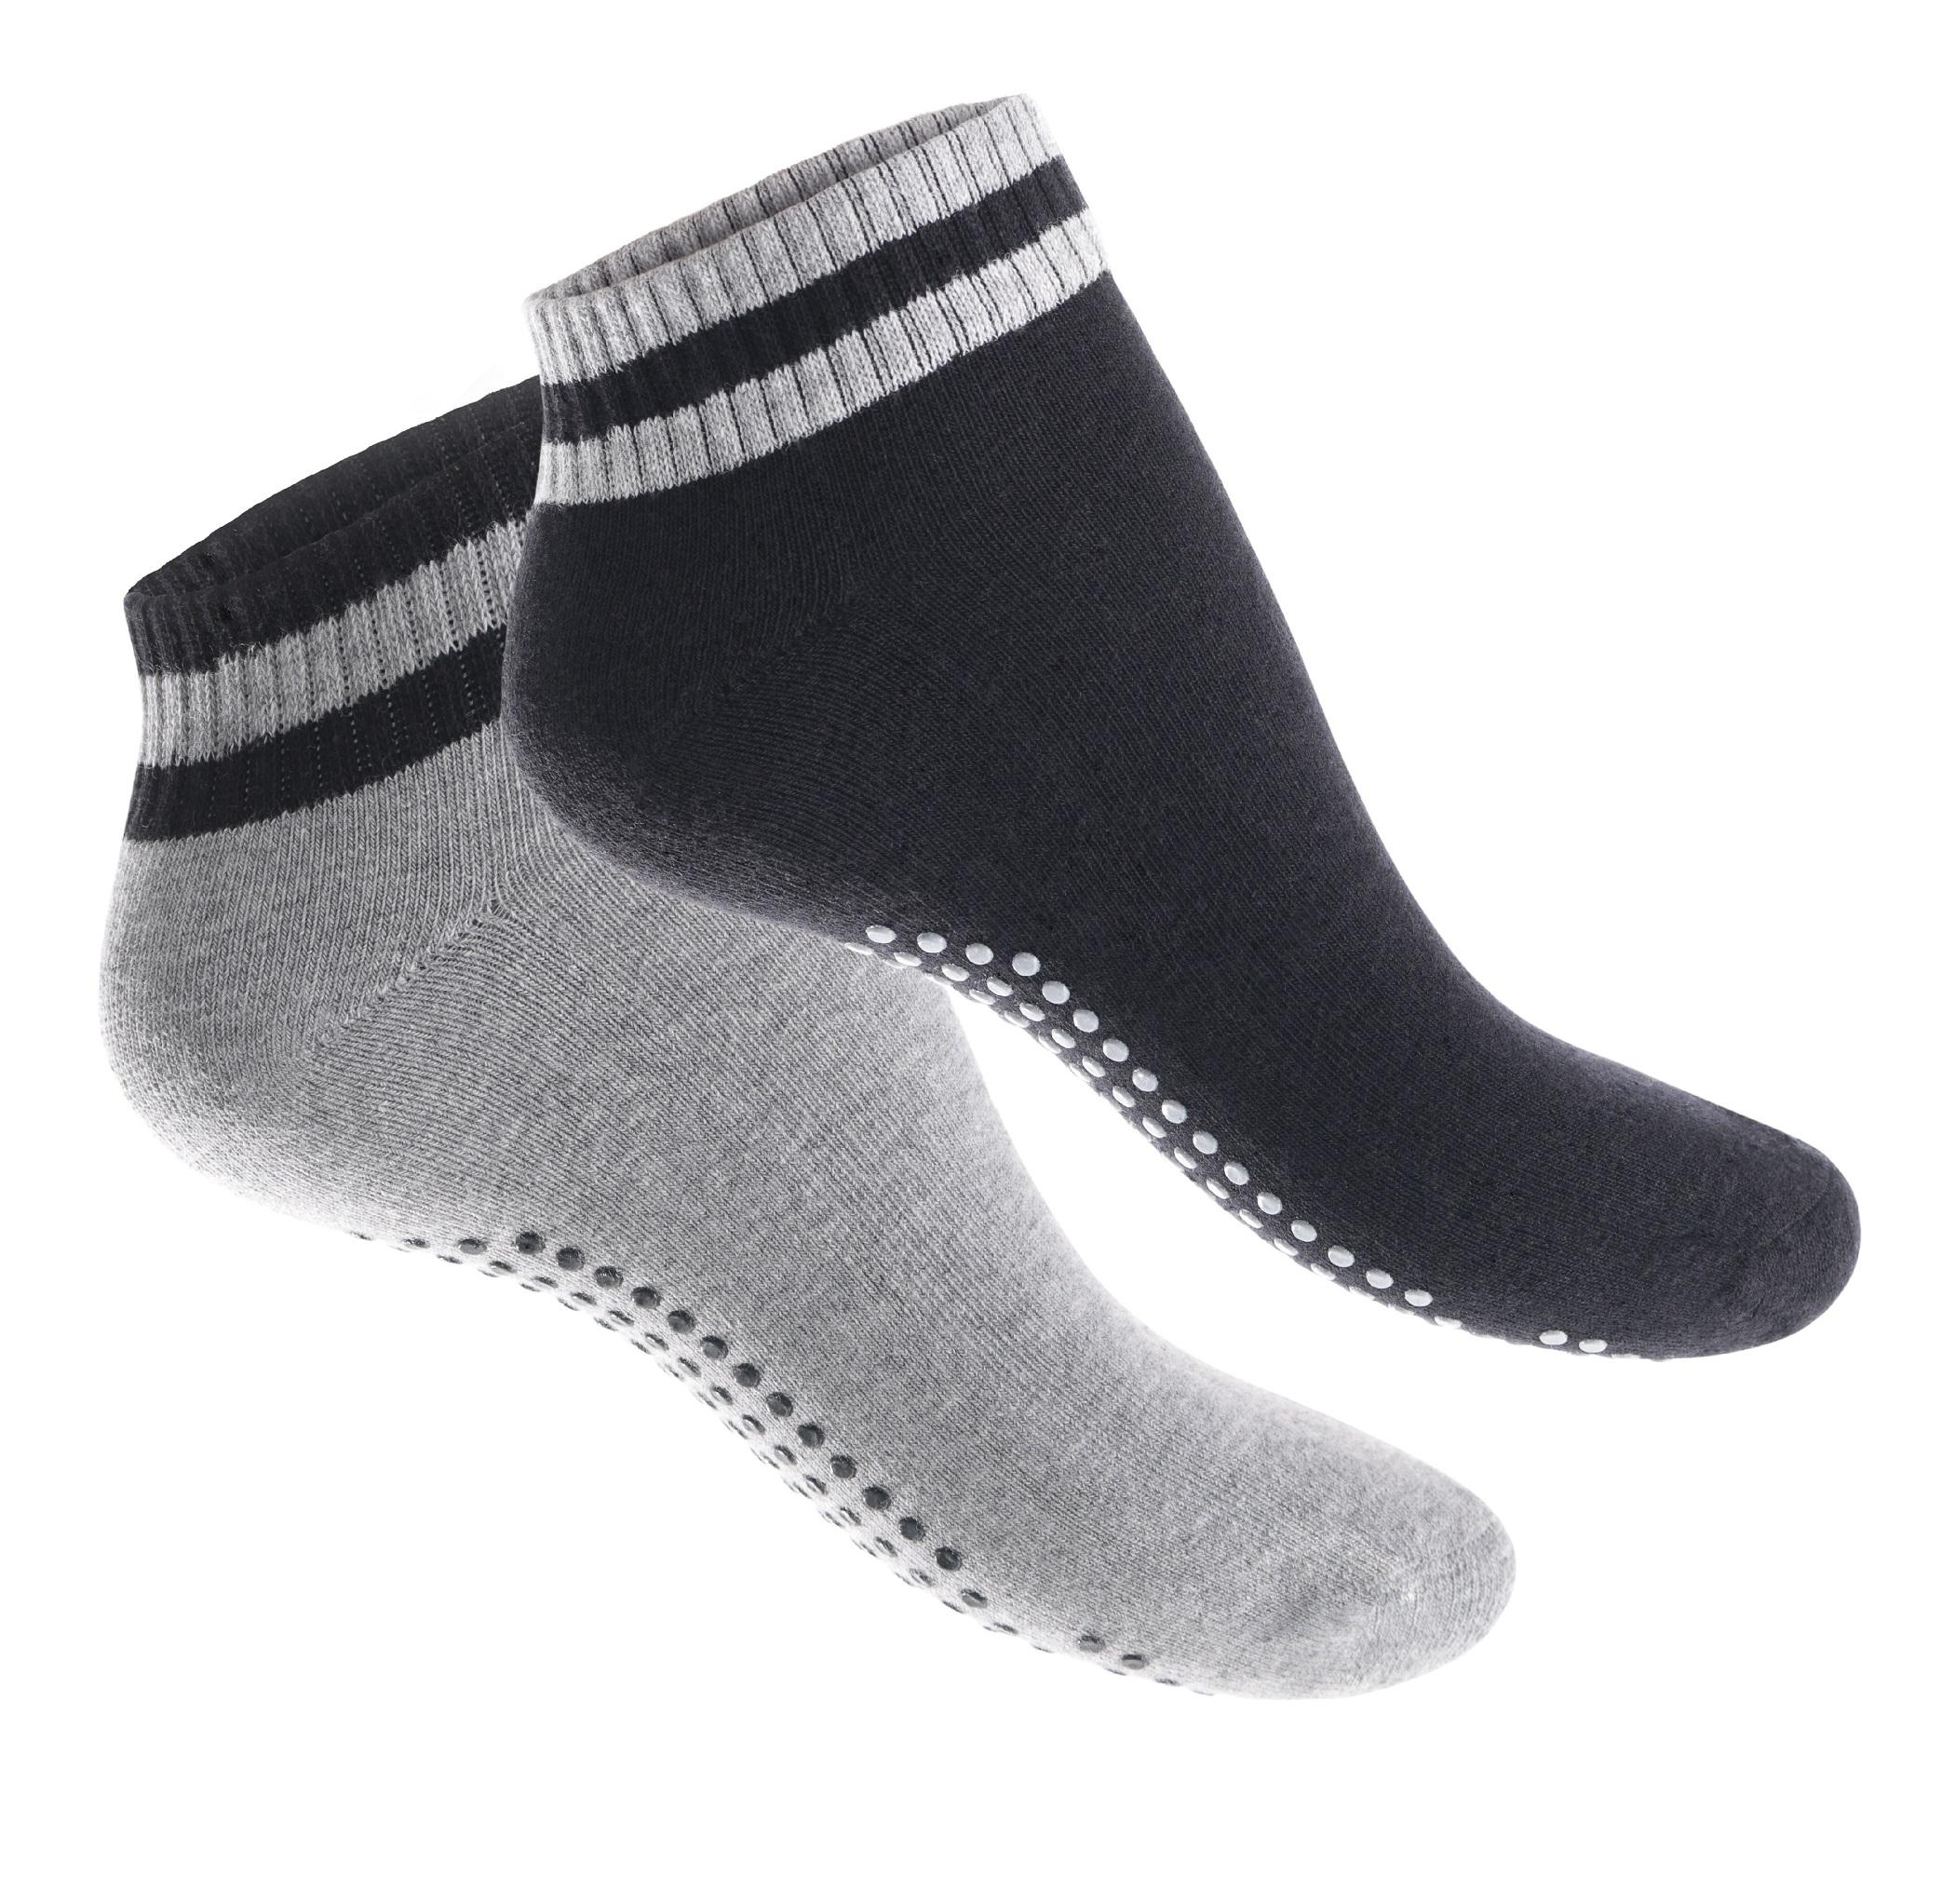 4-Paar-Yoga-Socken-Pilates-Socken-Antirutsch-Massage-Sohle